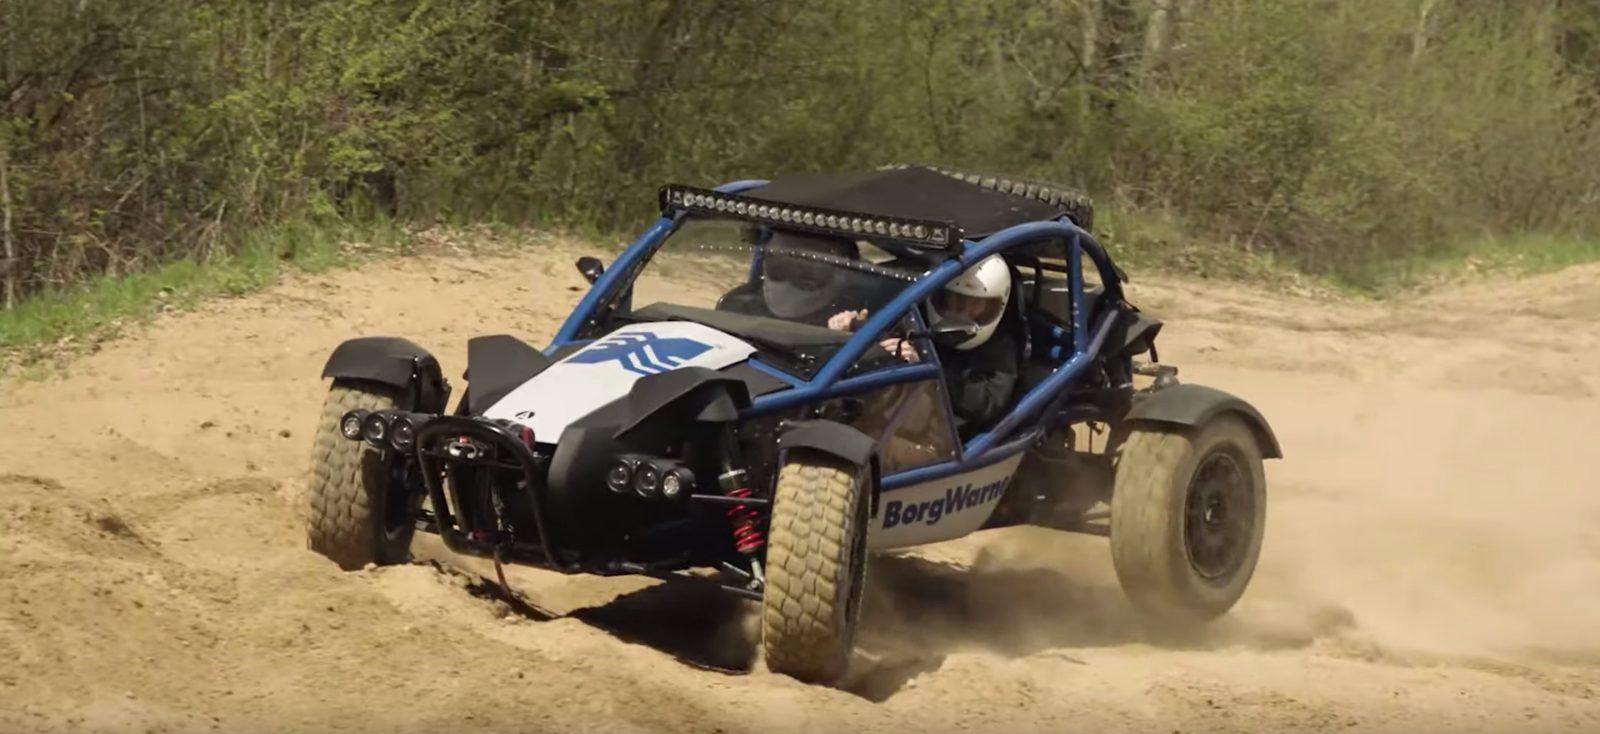 Ariel Nomad Price >> BorgWarner turns Ariel Nomad into electric off-road beast - Electrek